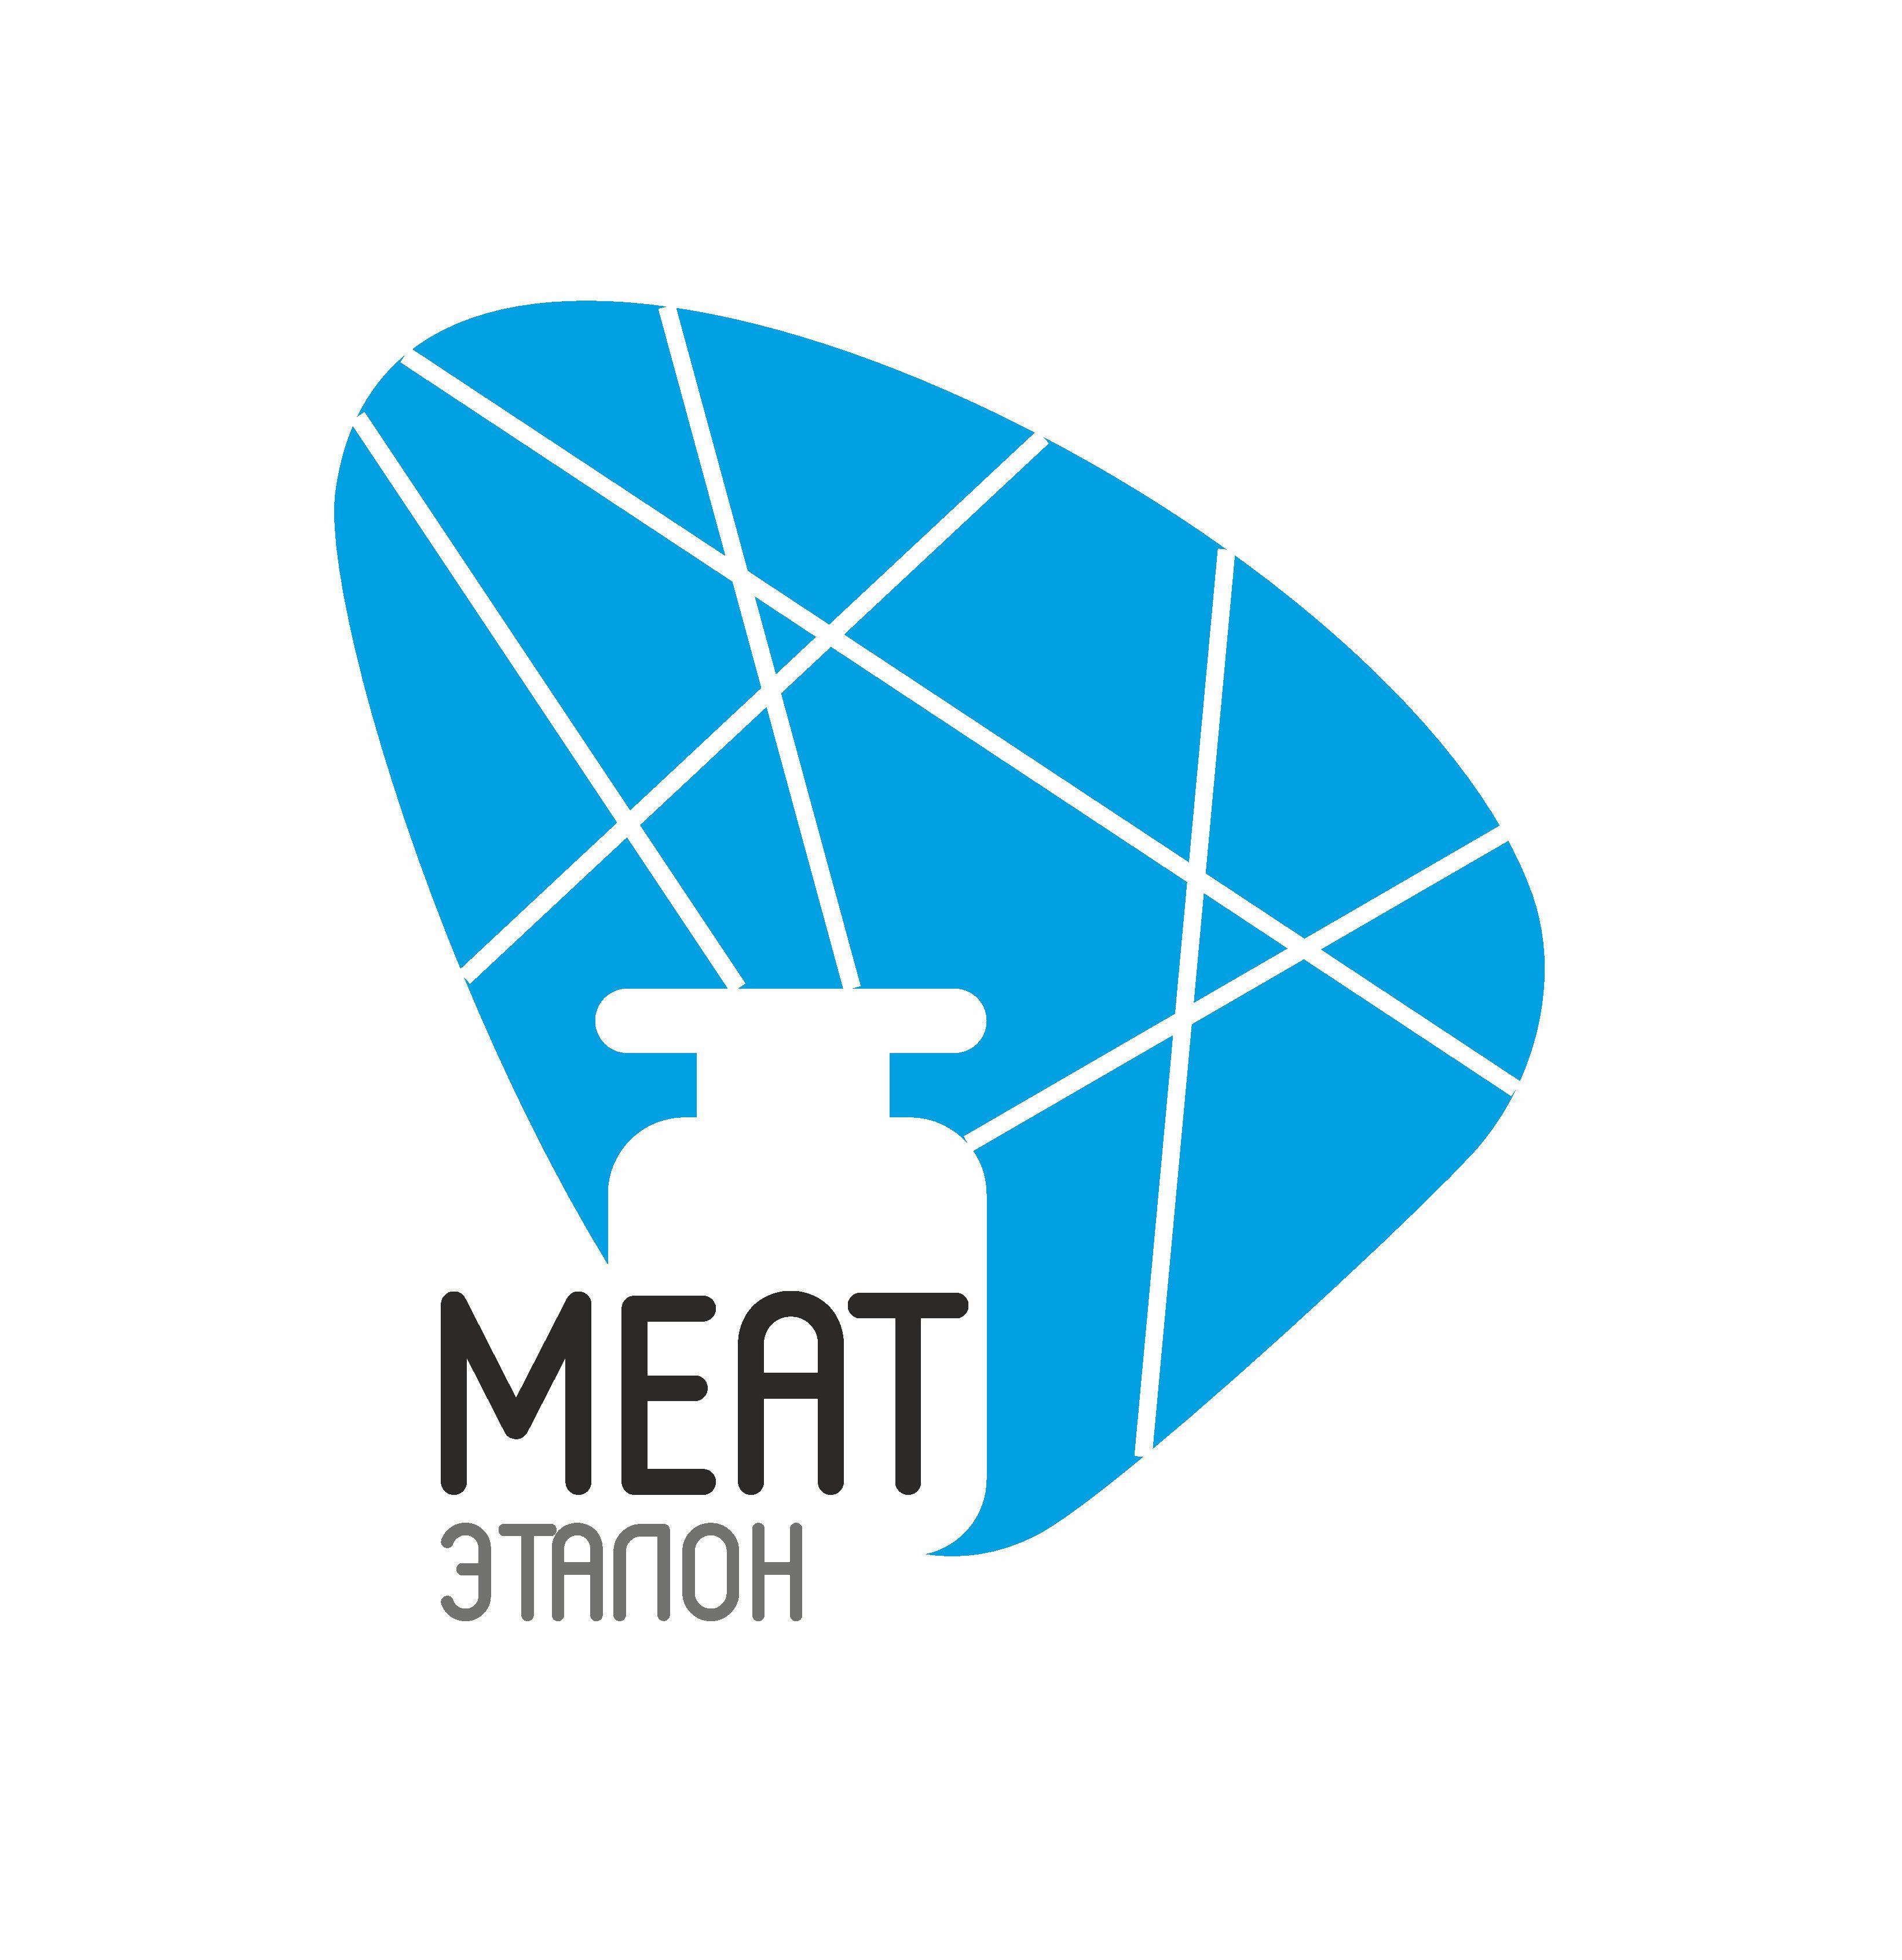 Логотип компании «Meat эталон» фото f_75856f2a247a6be8.jpg